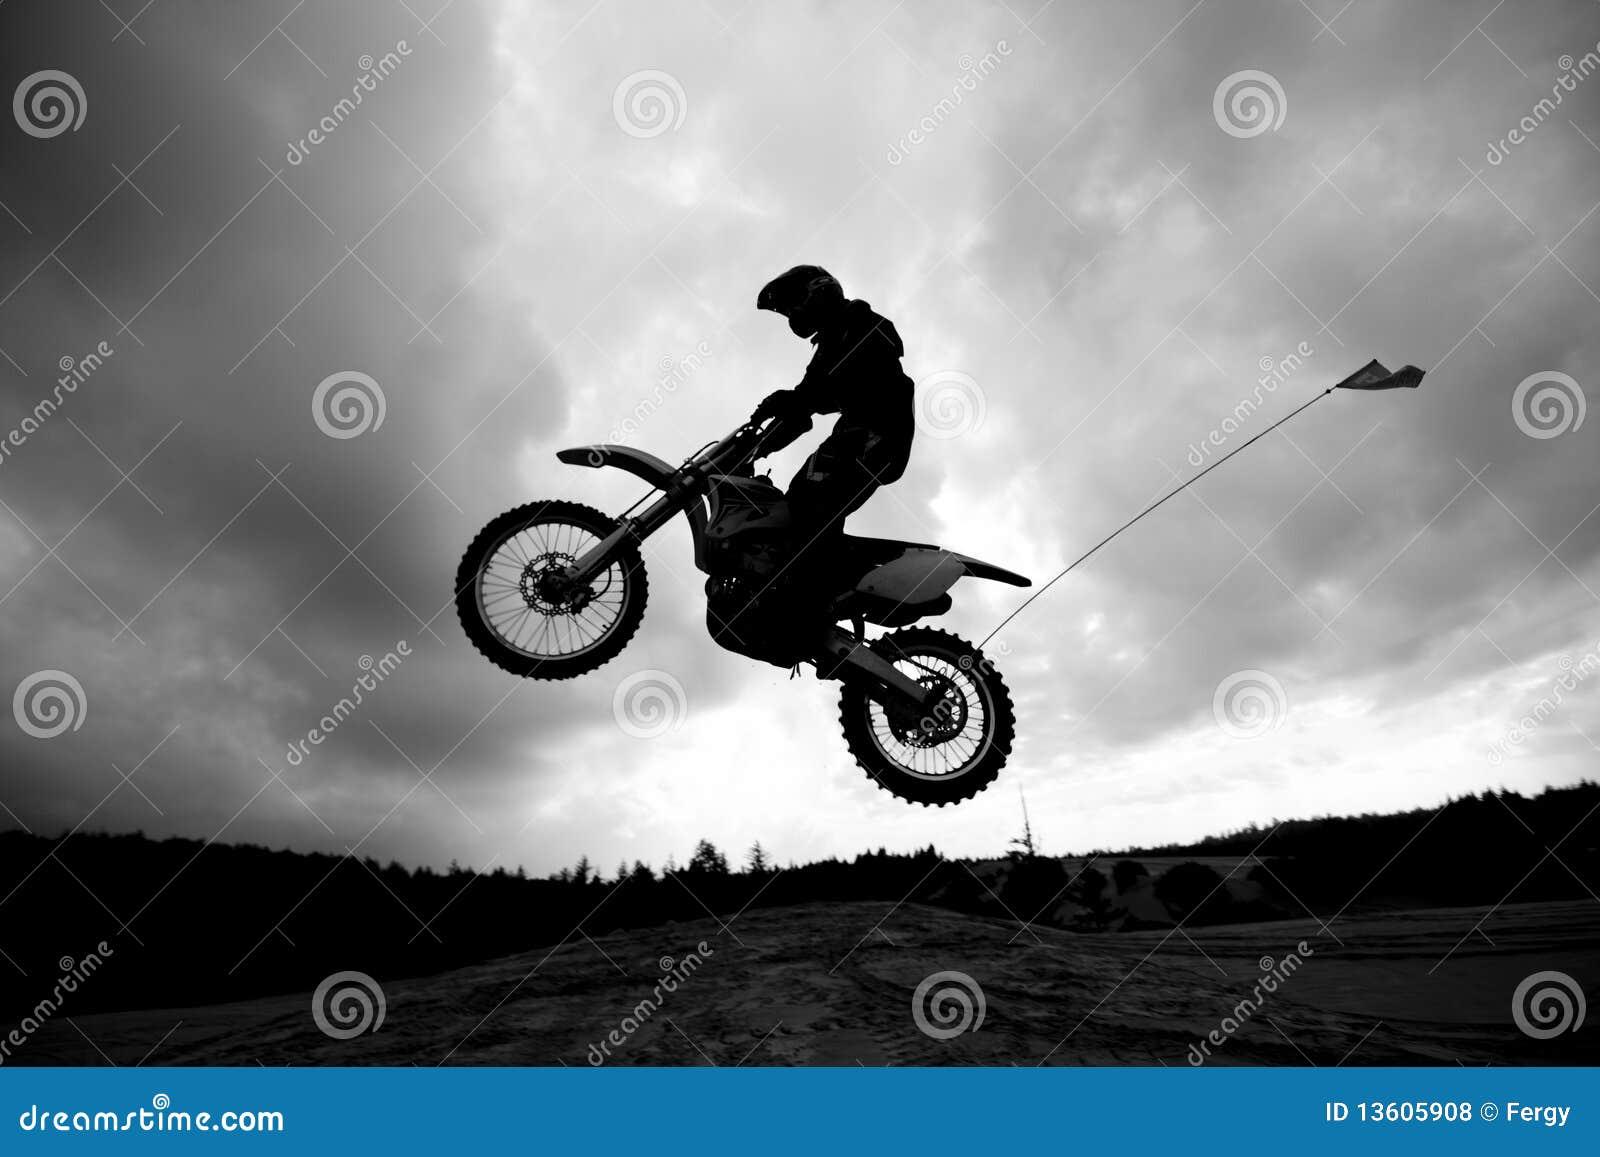 Dirt Bike Jumping Sand Dunes Sihlouette Royalty Free Stock